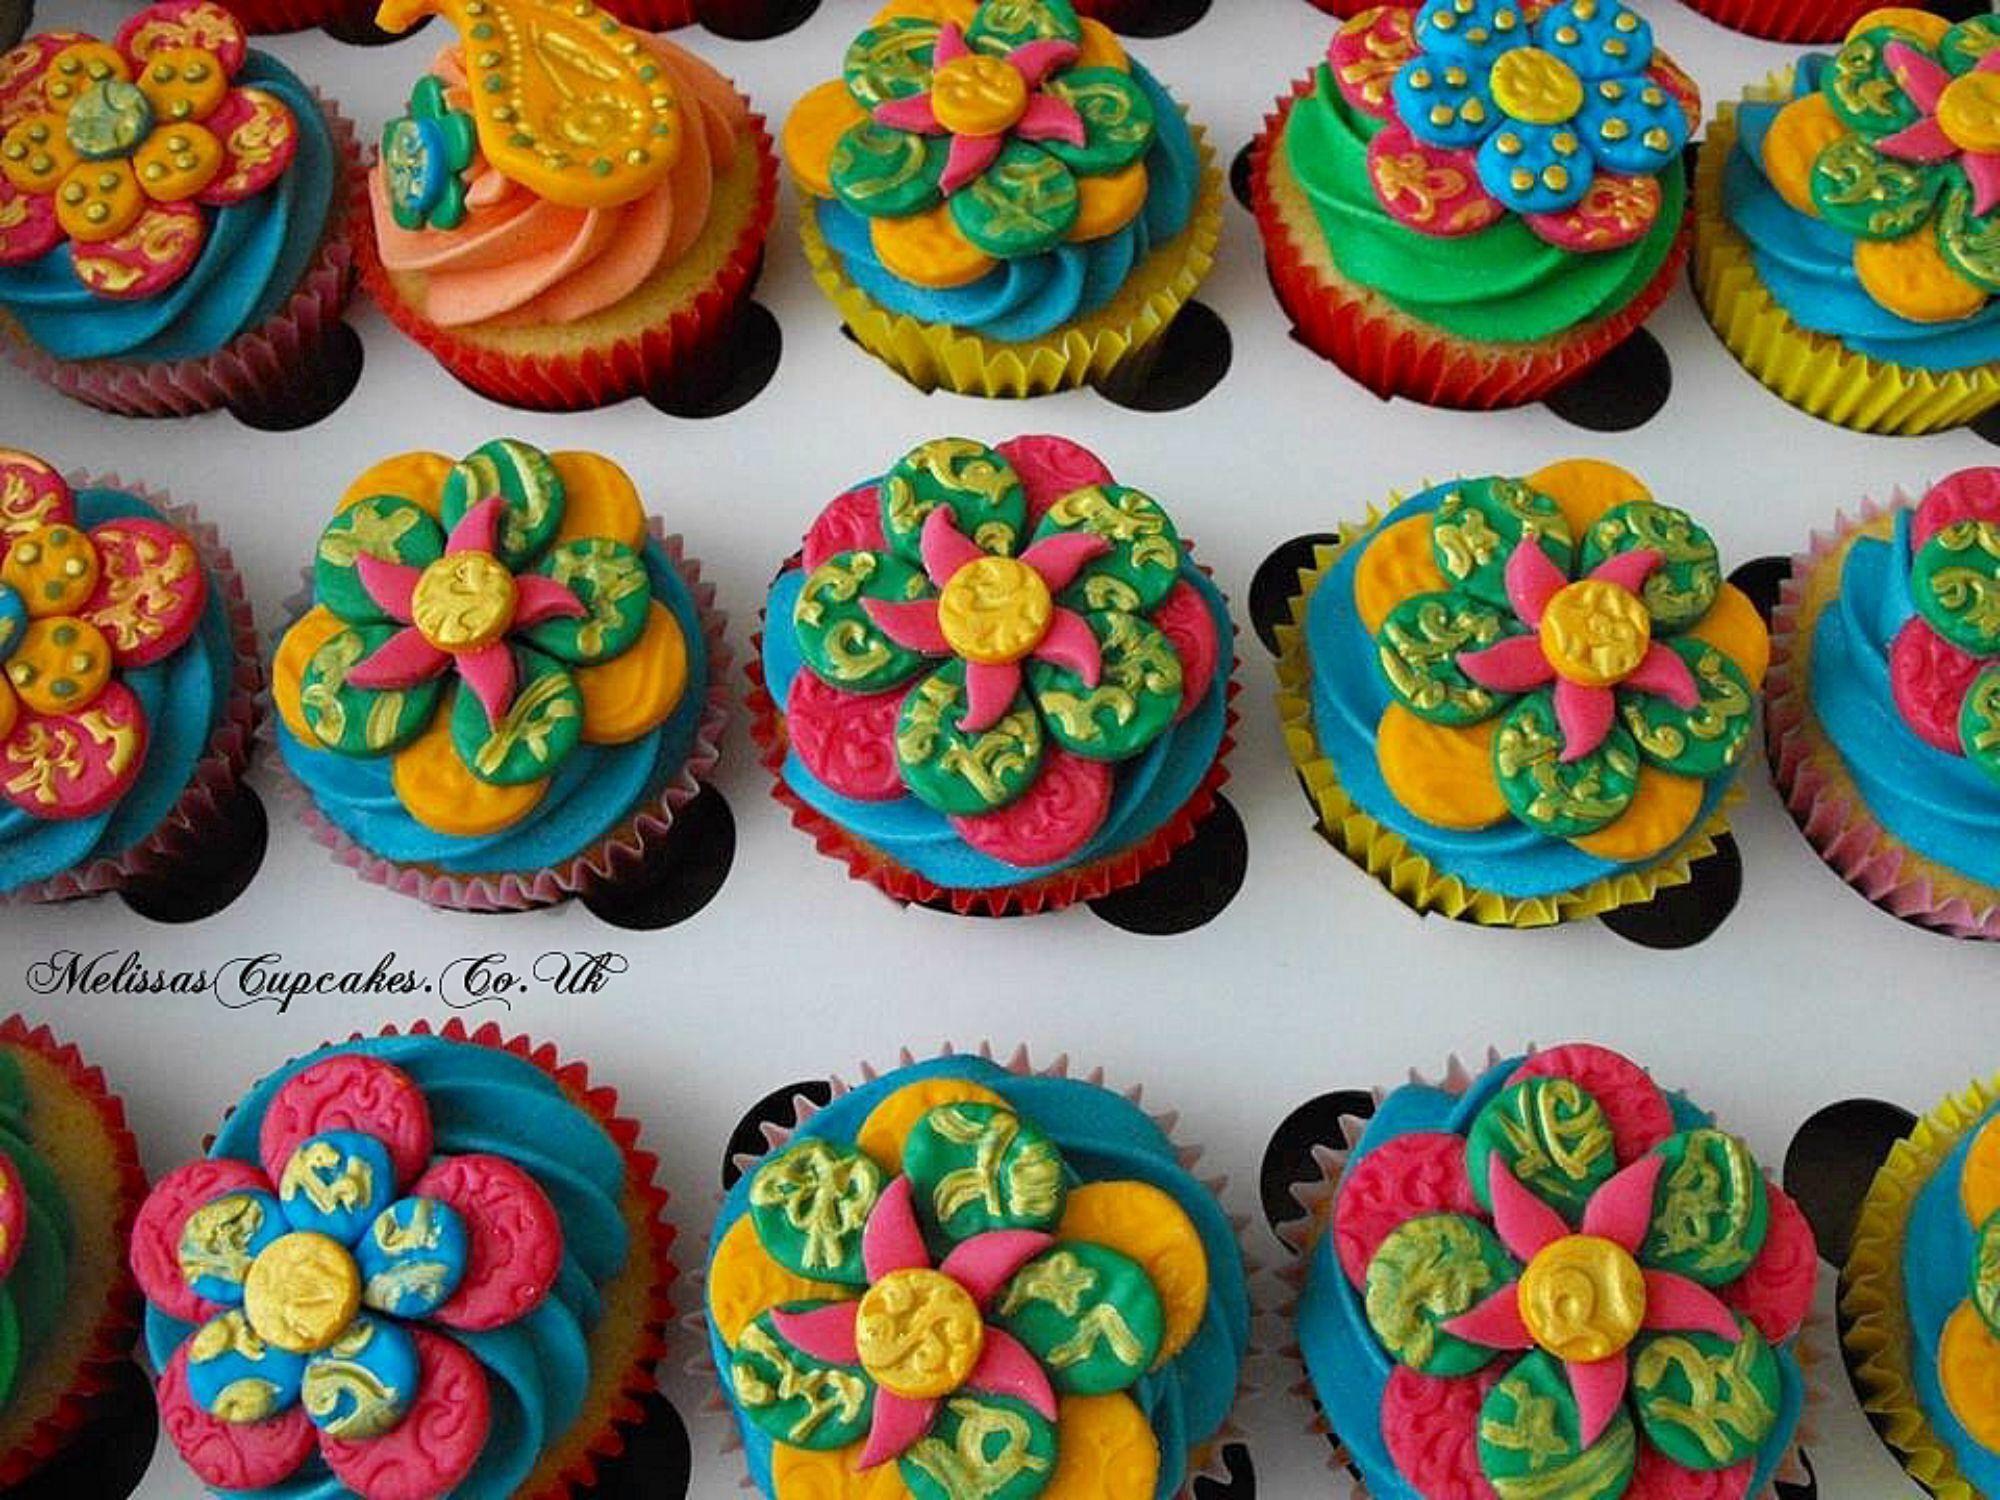 Mehndi Inspired Cake : Mehndi cupcakes novelty by melissa s